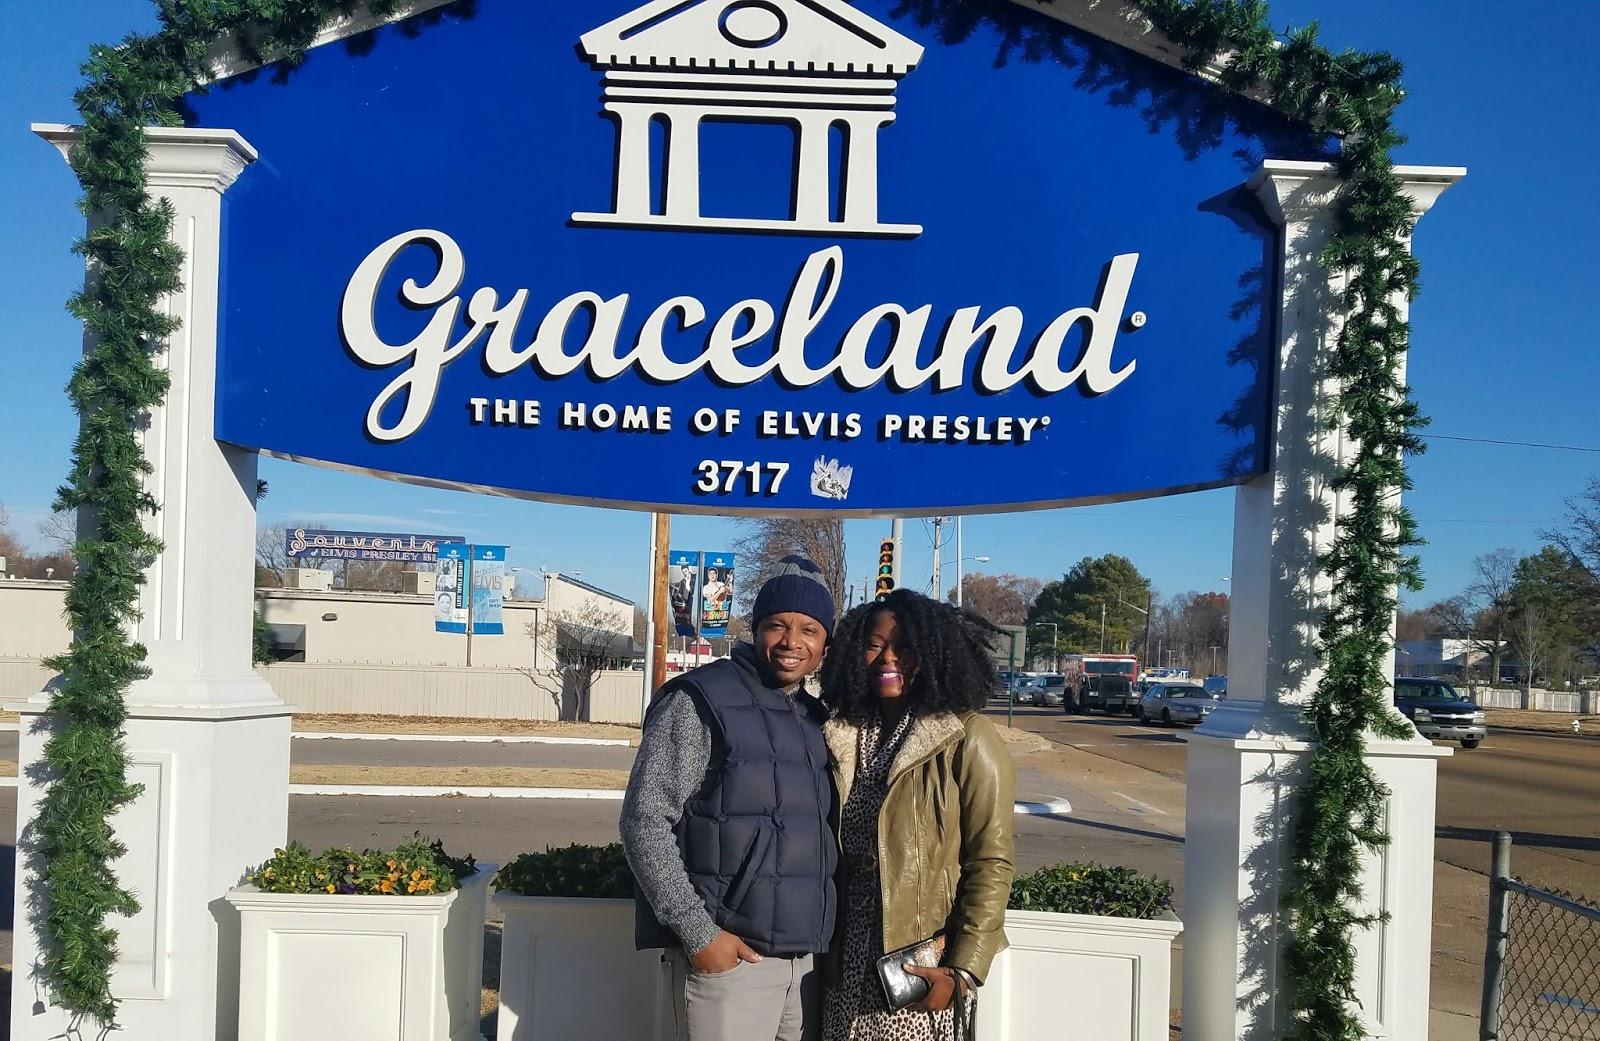 Graceland Private Tours